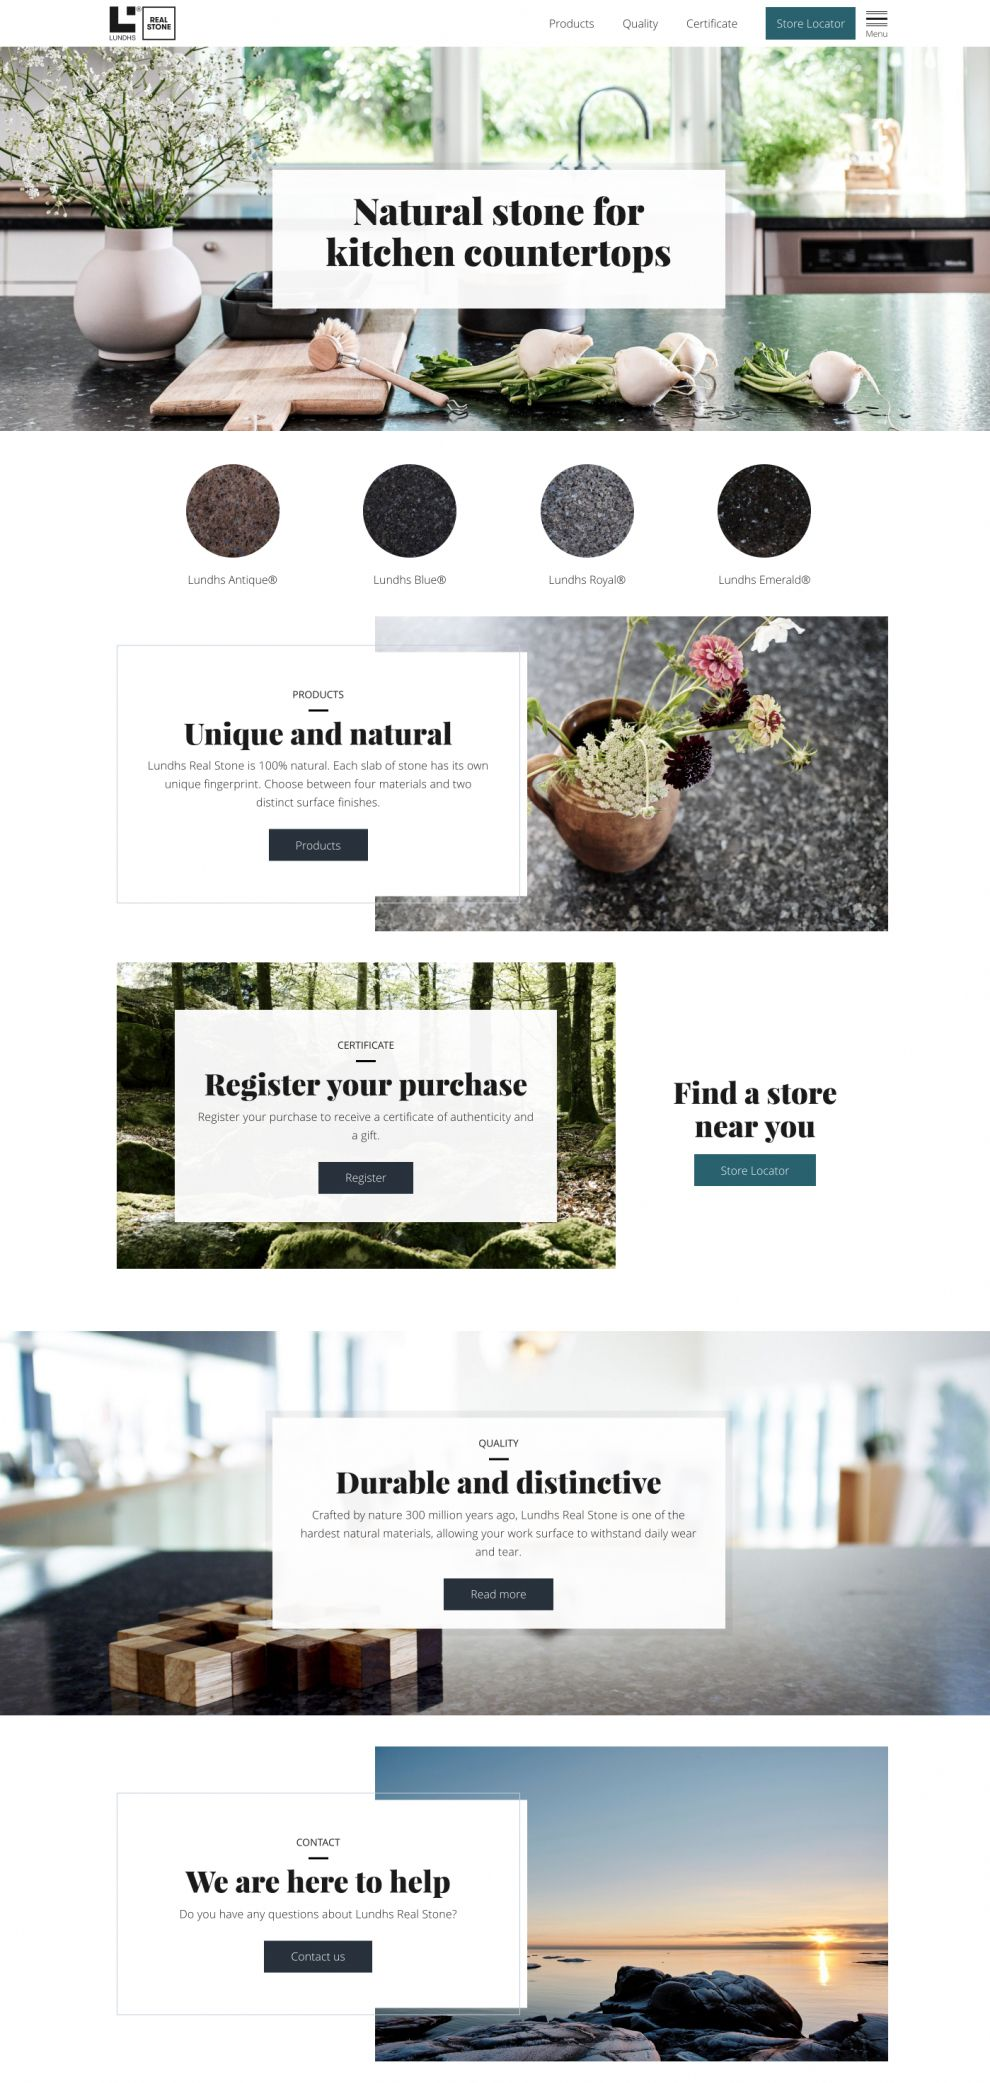 Lundhs Real Stone Elegant Homepage